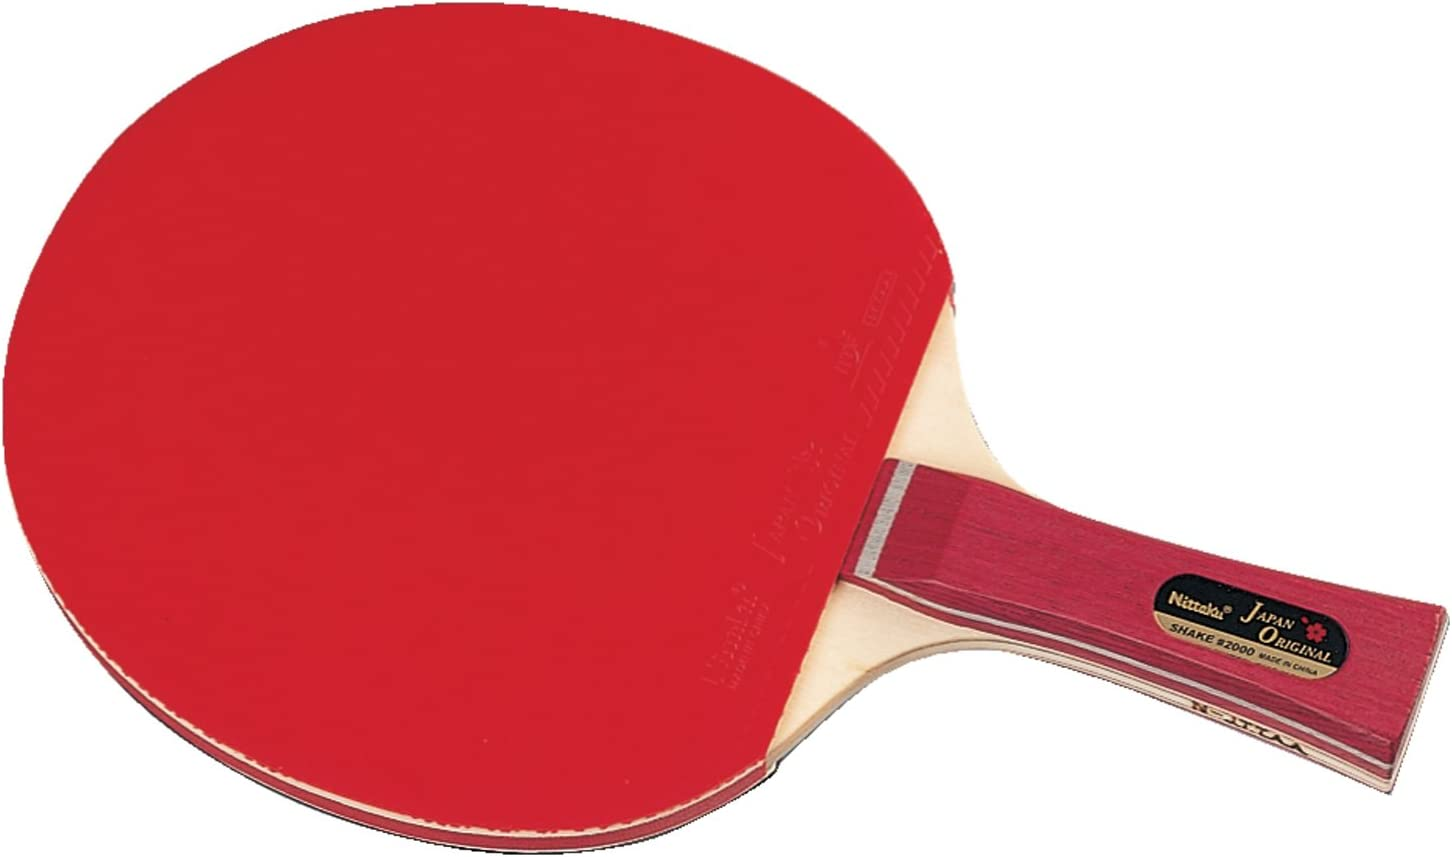 Indianapolis Mall nittaku Nittaku Table Clearance SALE Limited time Tennis Racket Original Japan Plus Milksh